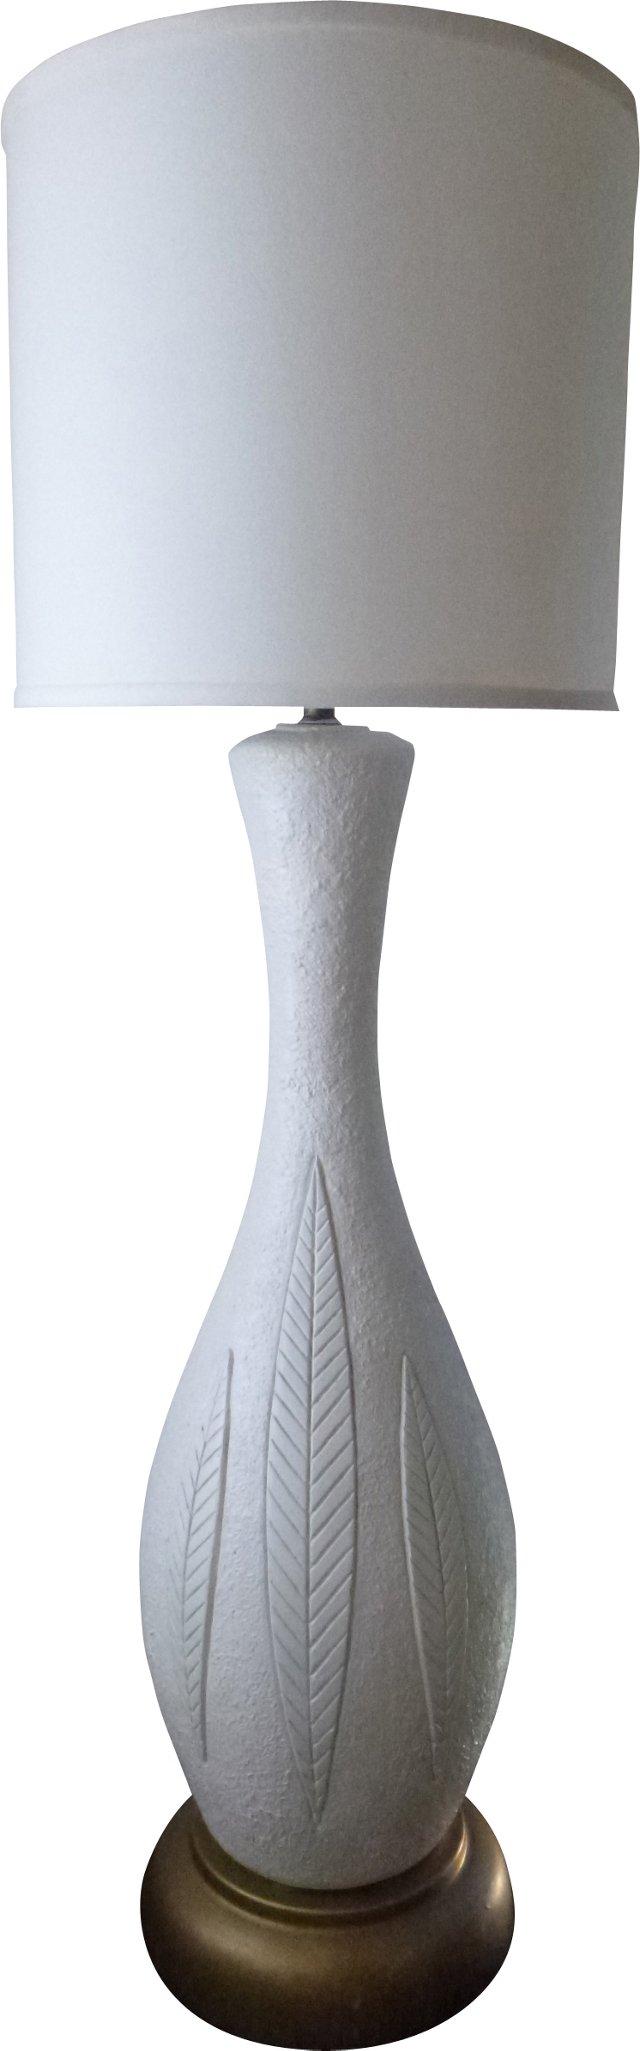 Midcentury Plaster Leaves Lamp